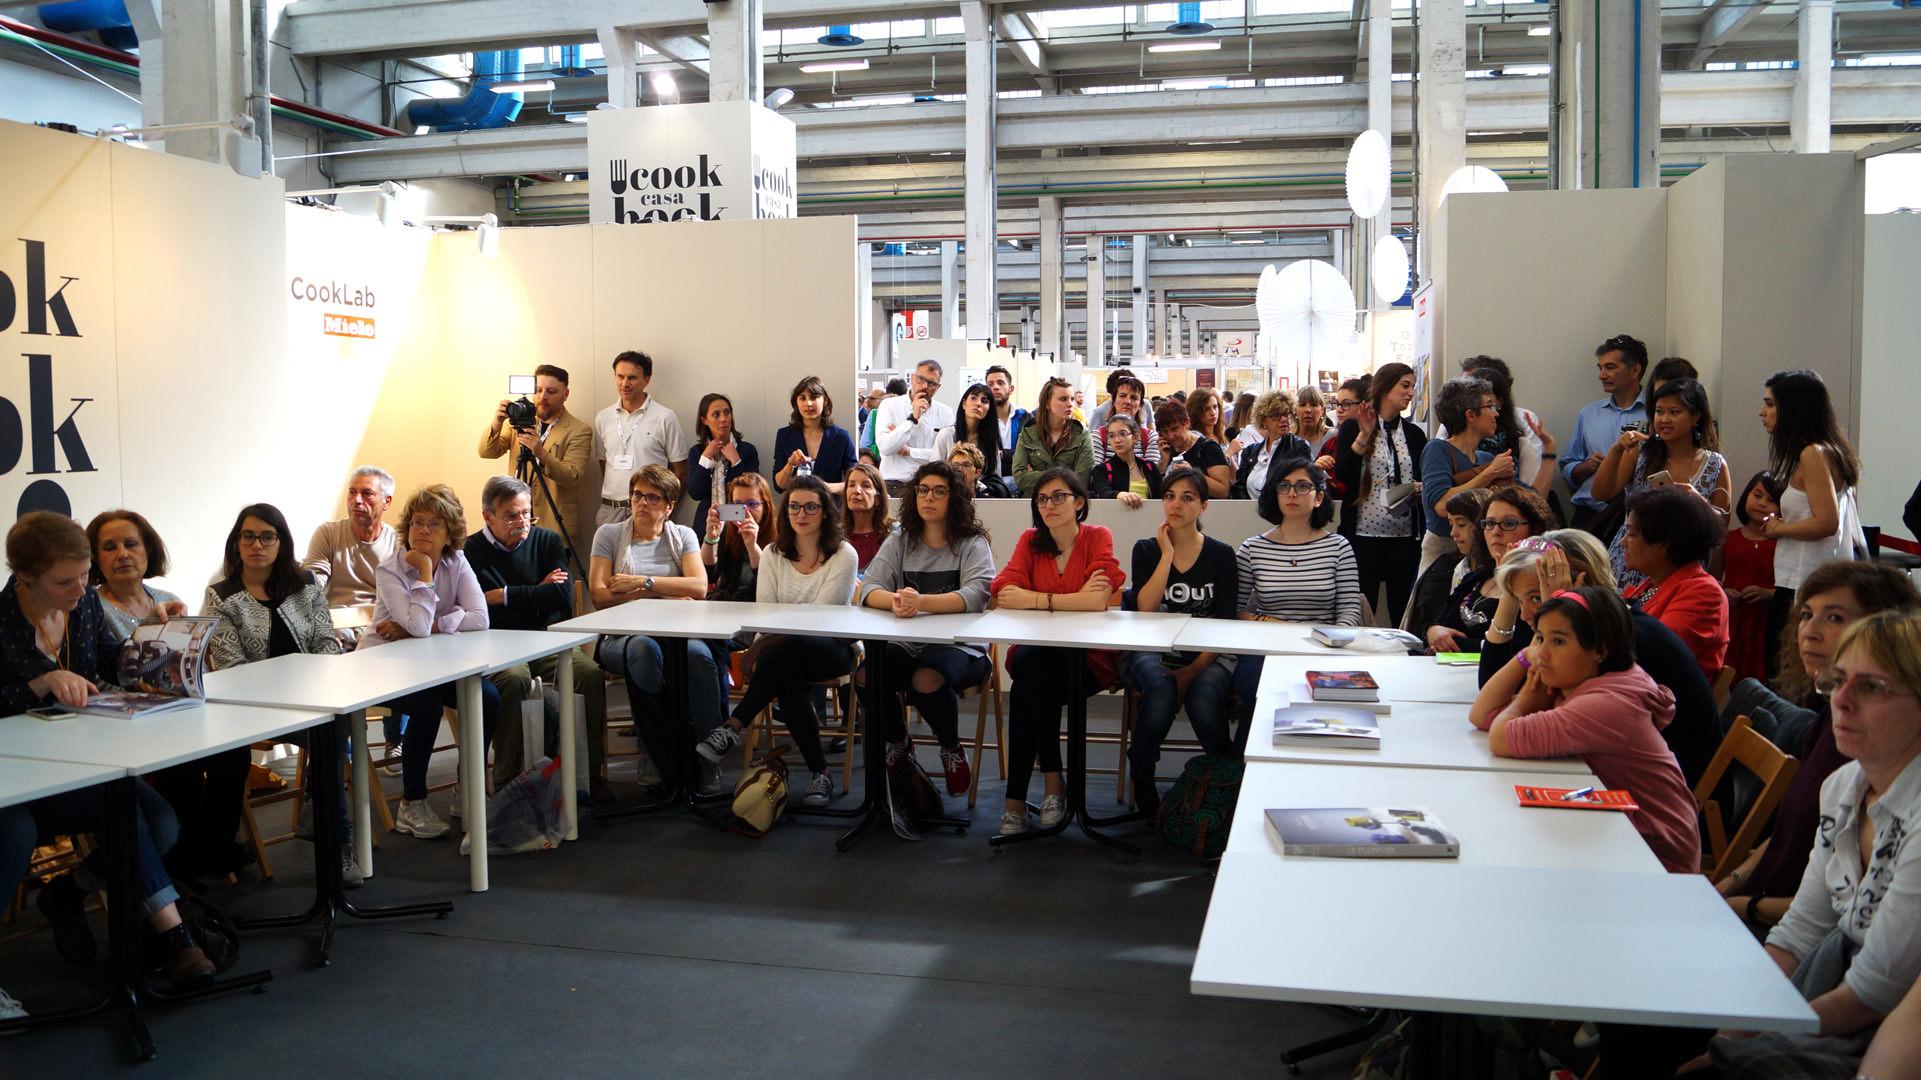 folla al cooklab (1)